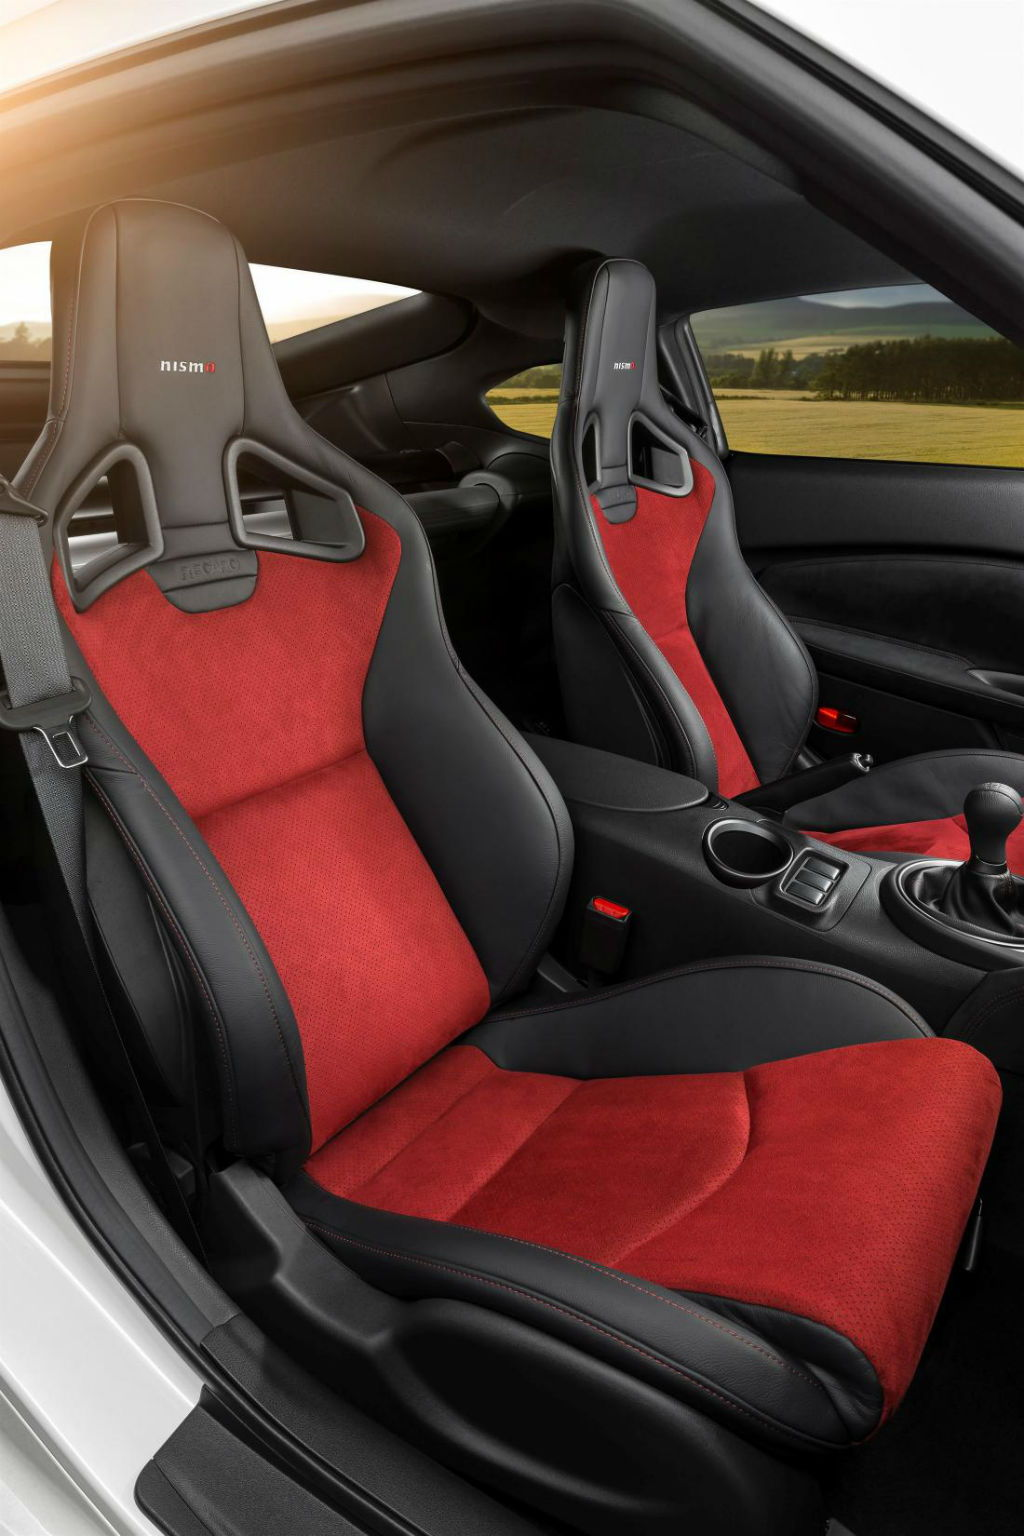 corvette seat office chair wheelchair man seats and more corvetteforum chevrolet